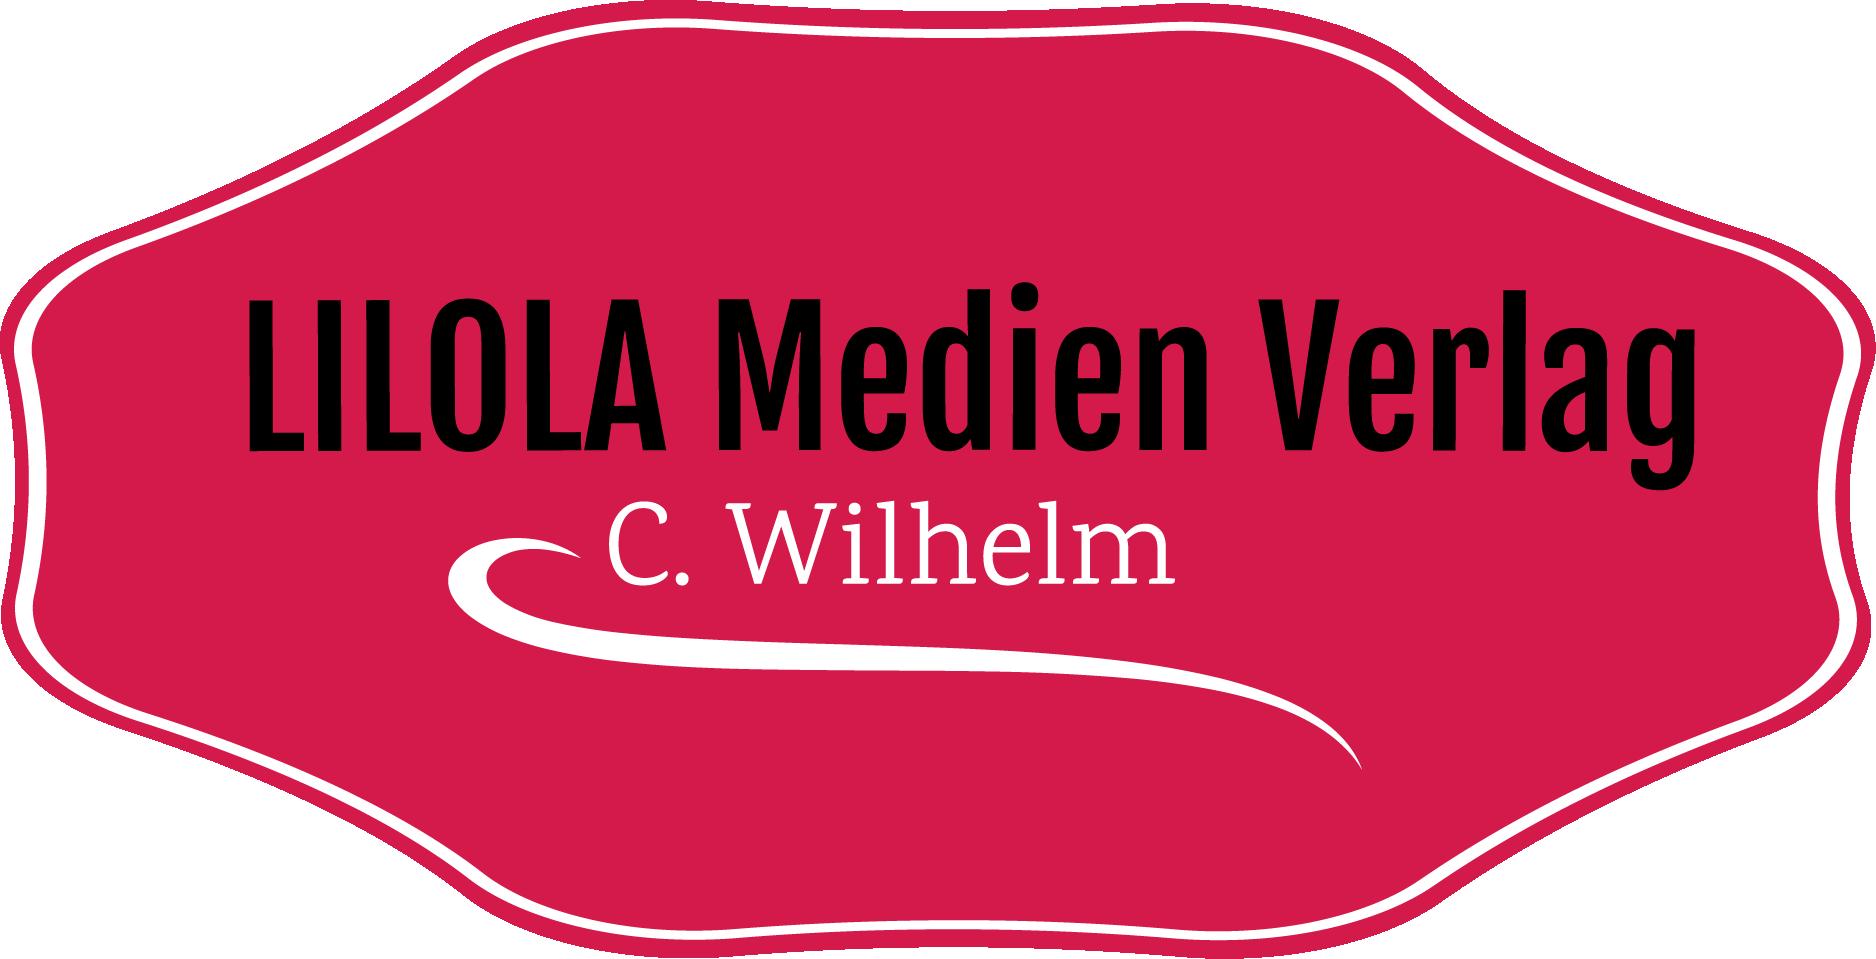 Lilola-Medienverlag/ C.Wilhelm